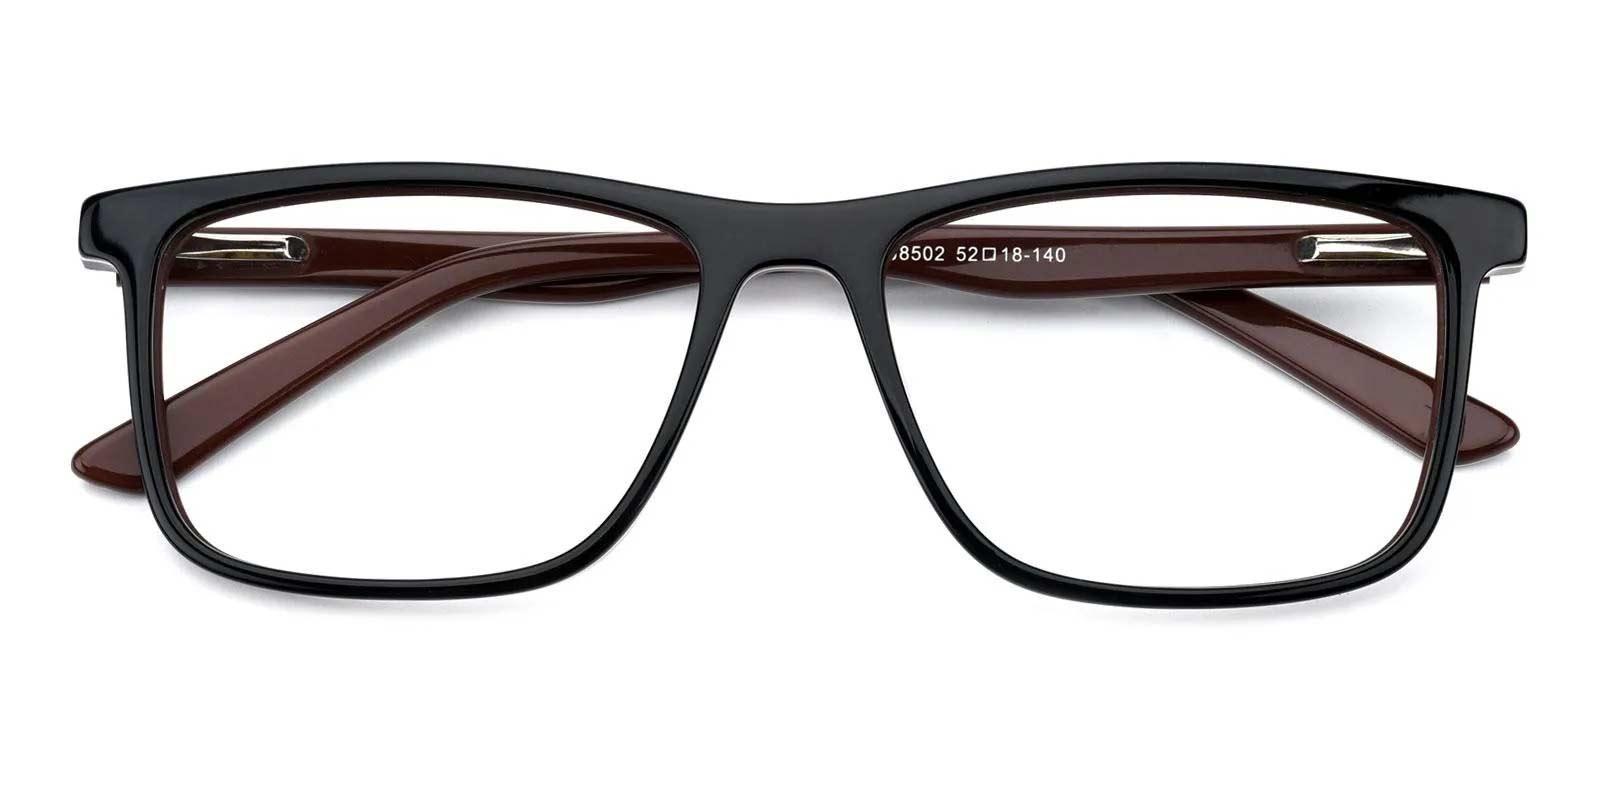 Tripper-Brown-Square-Acetate-Eyeglasses-detail